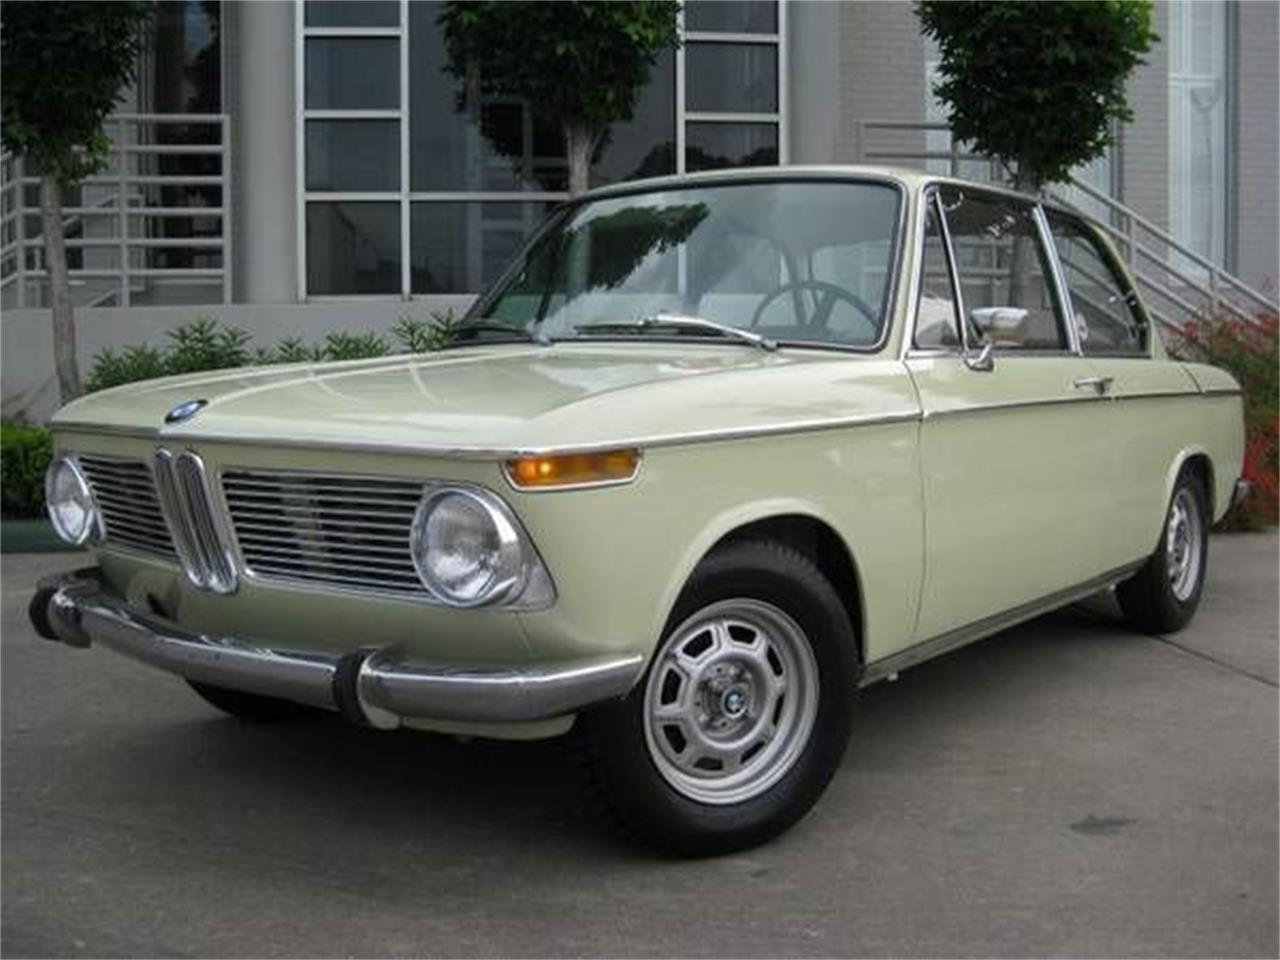 1969 Bmw 2002 For Sale Classiccarscom Cc 1120507